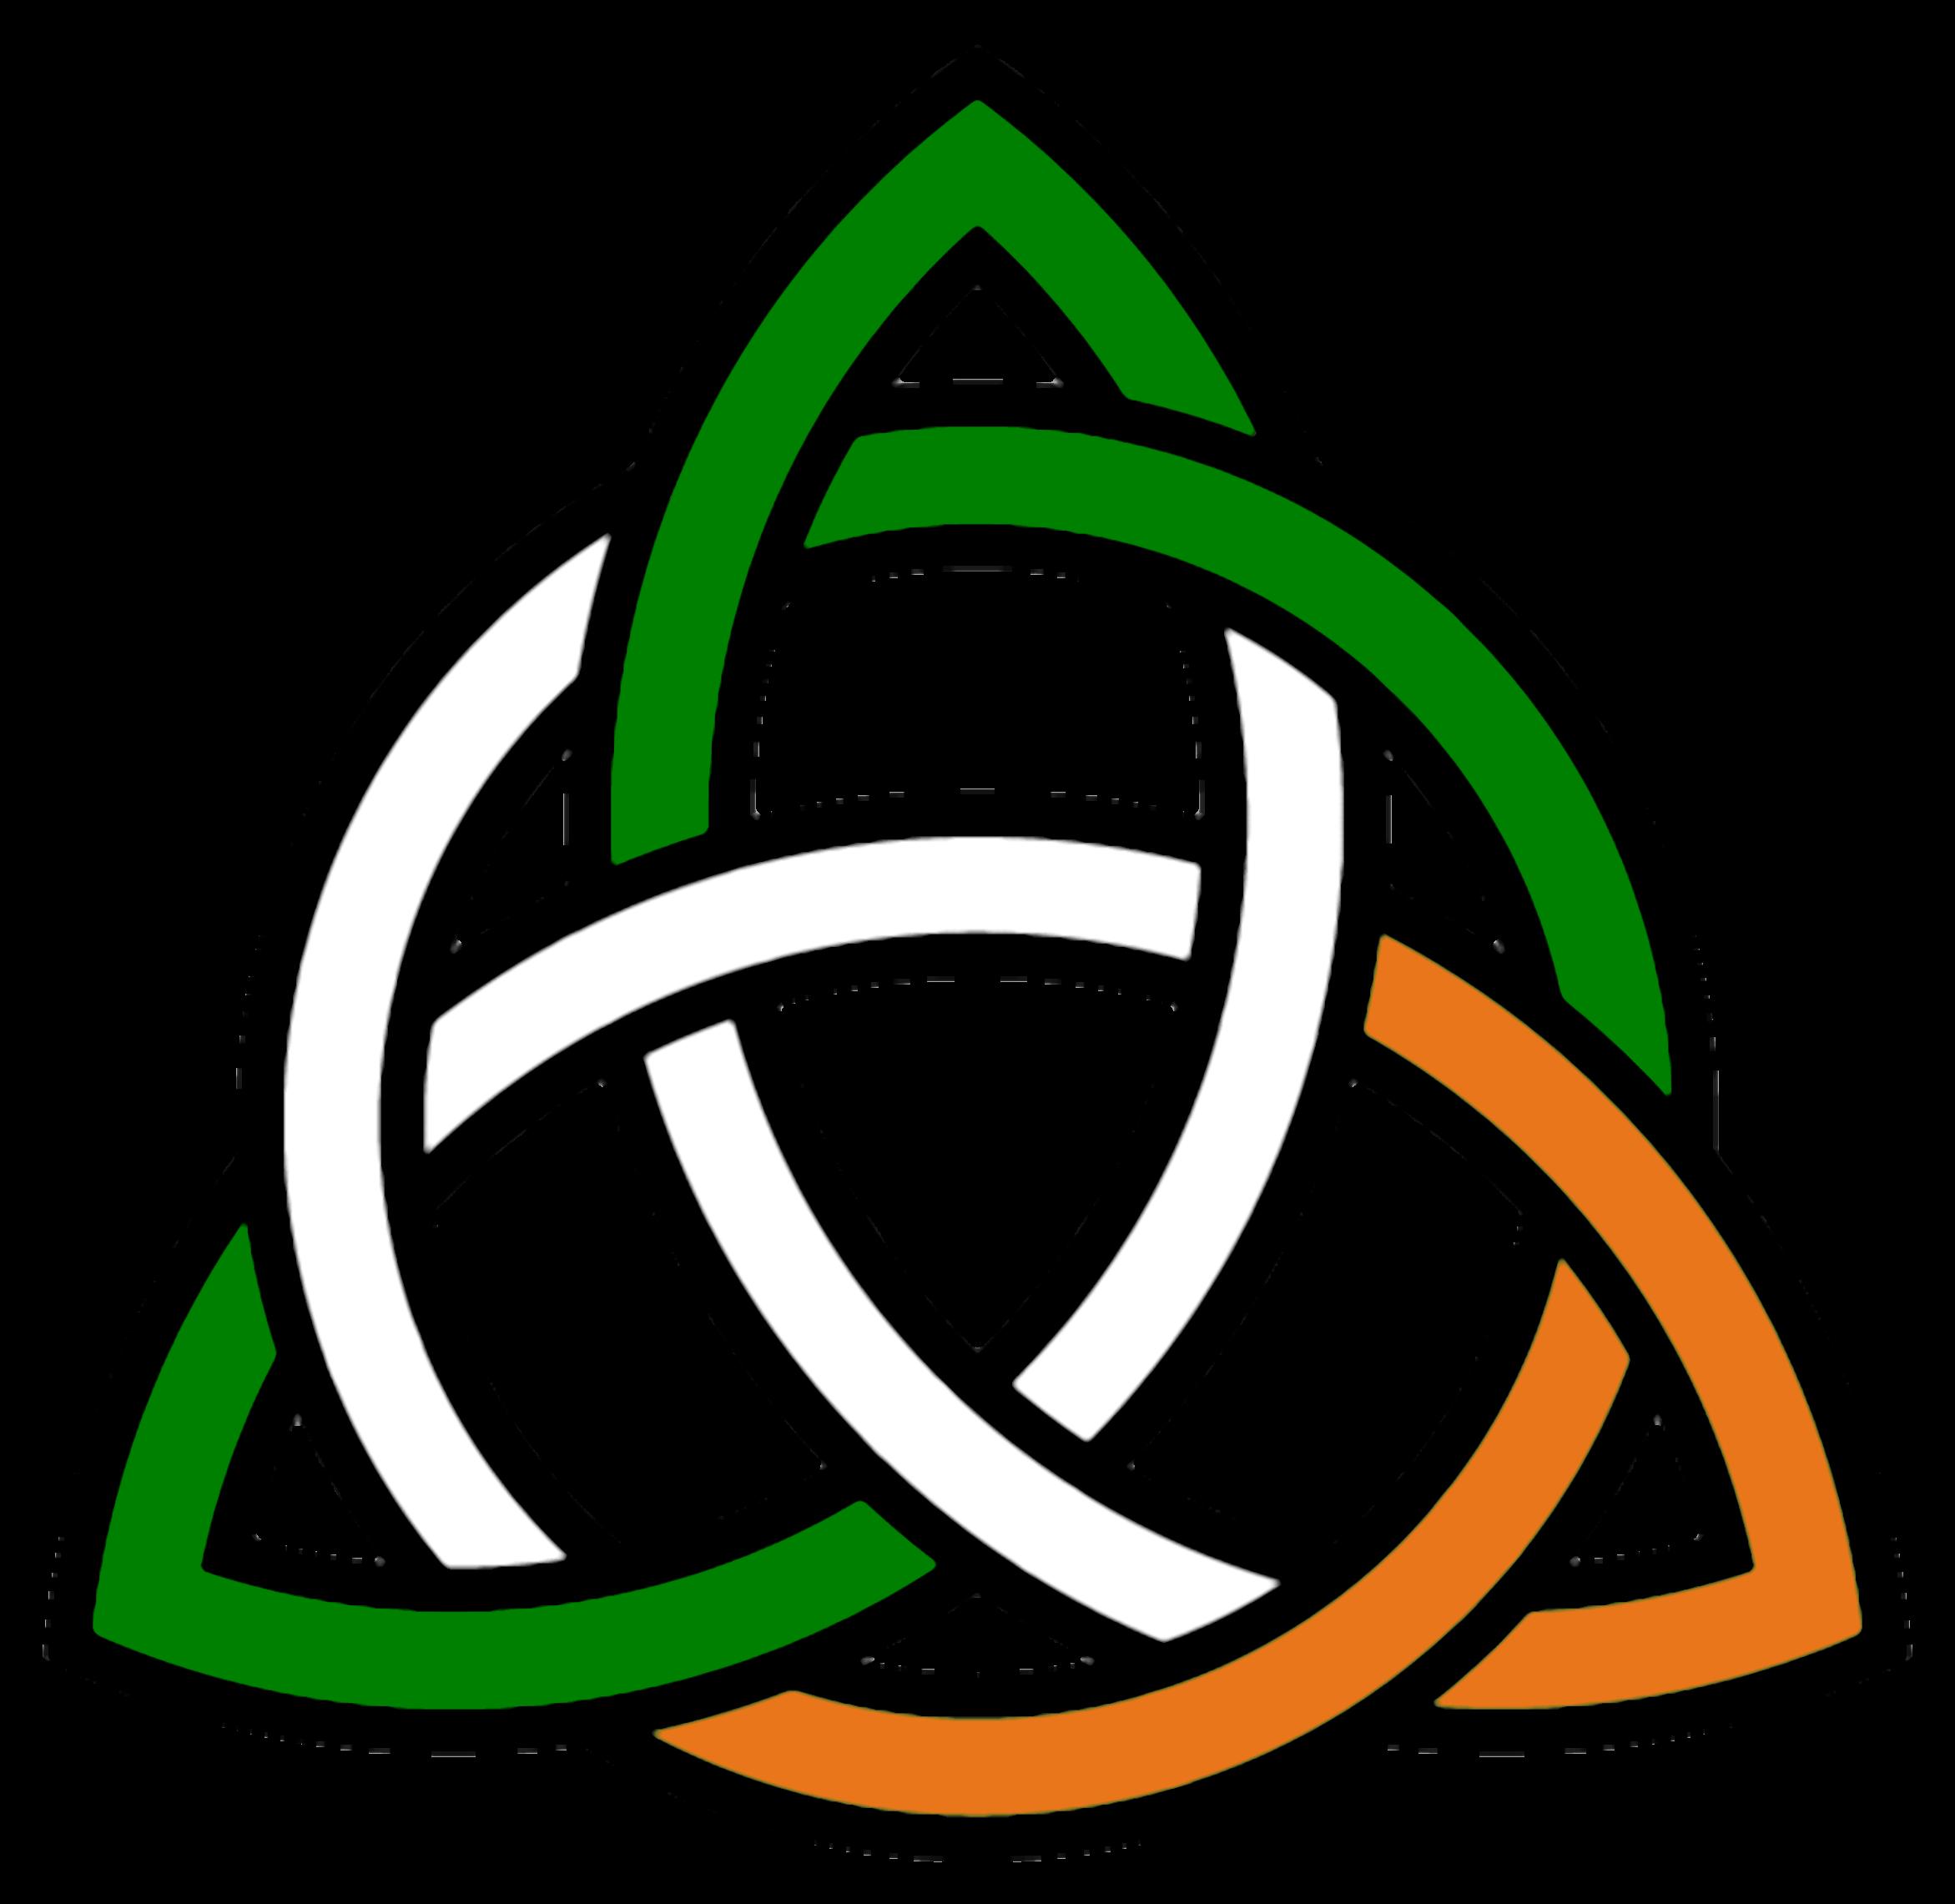 Celt clipart trinity knot #10